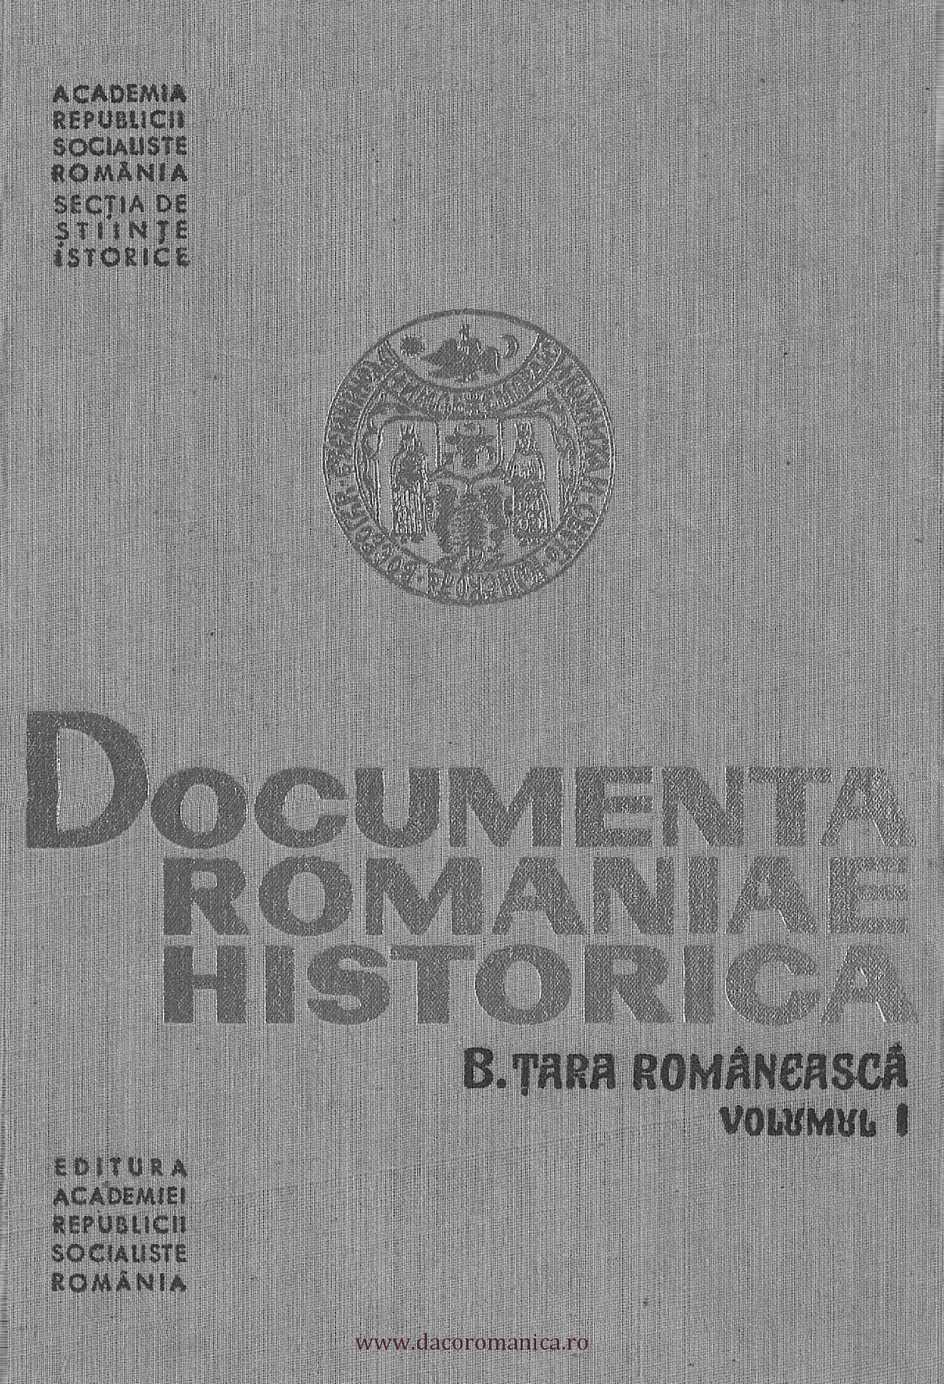 DRH. Seria B Ţara Românească. Volumul 1 1247-1500